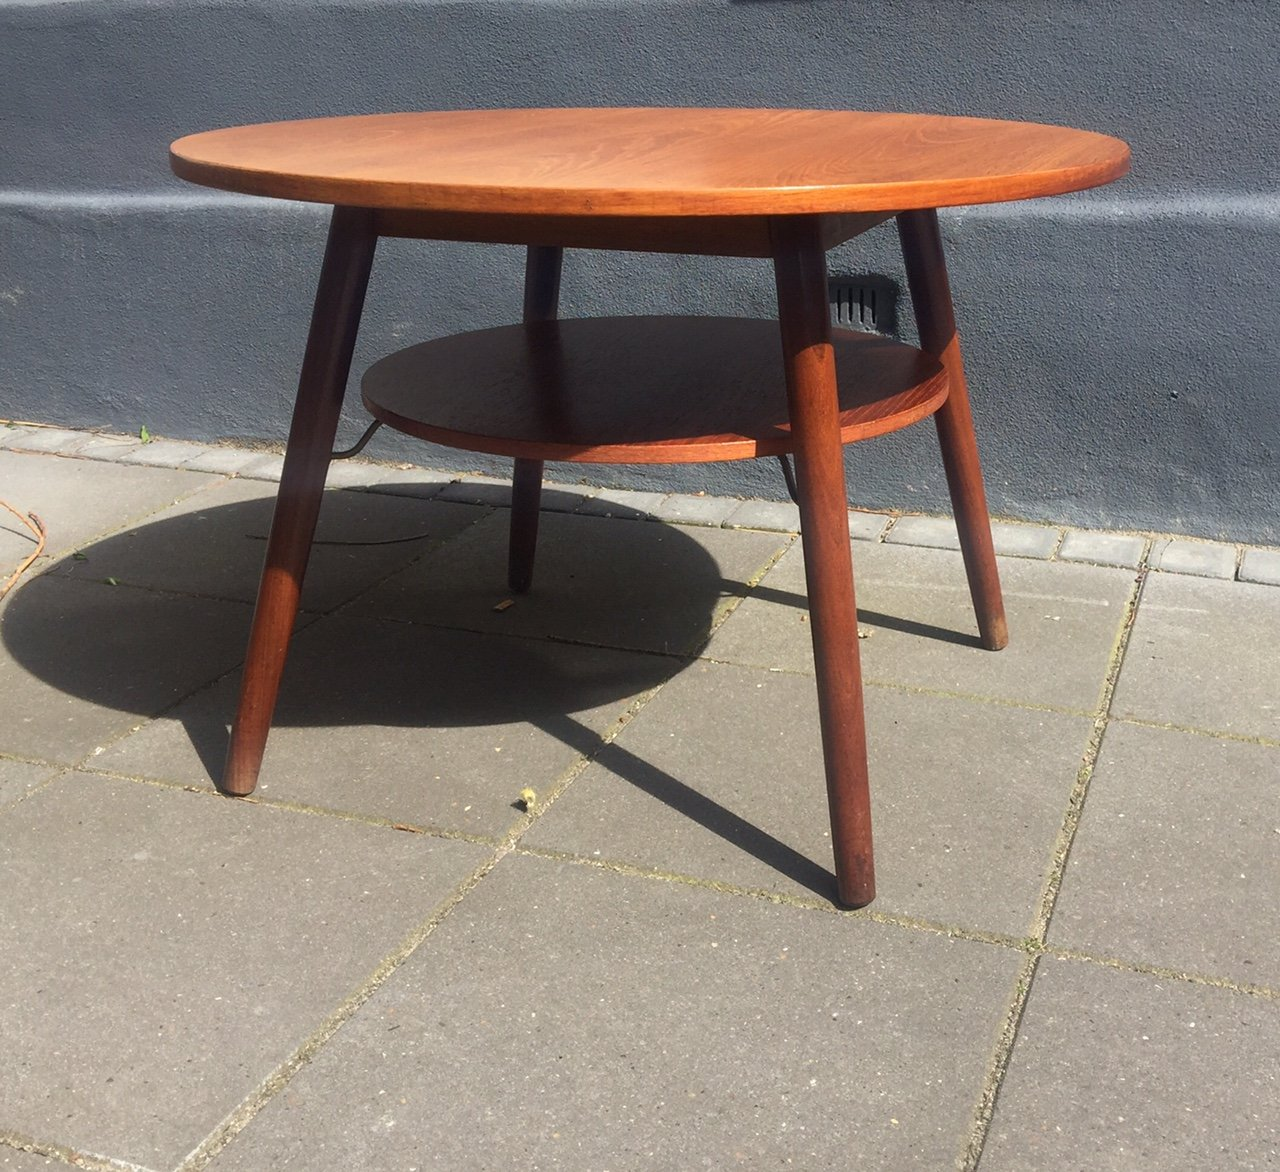 Vintage Round Danish Teak Coffee Table With Floating